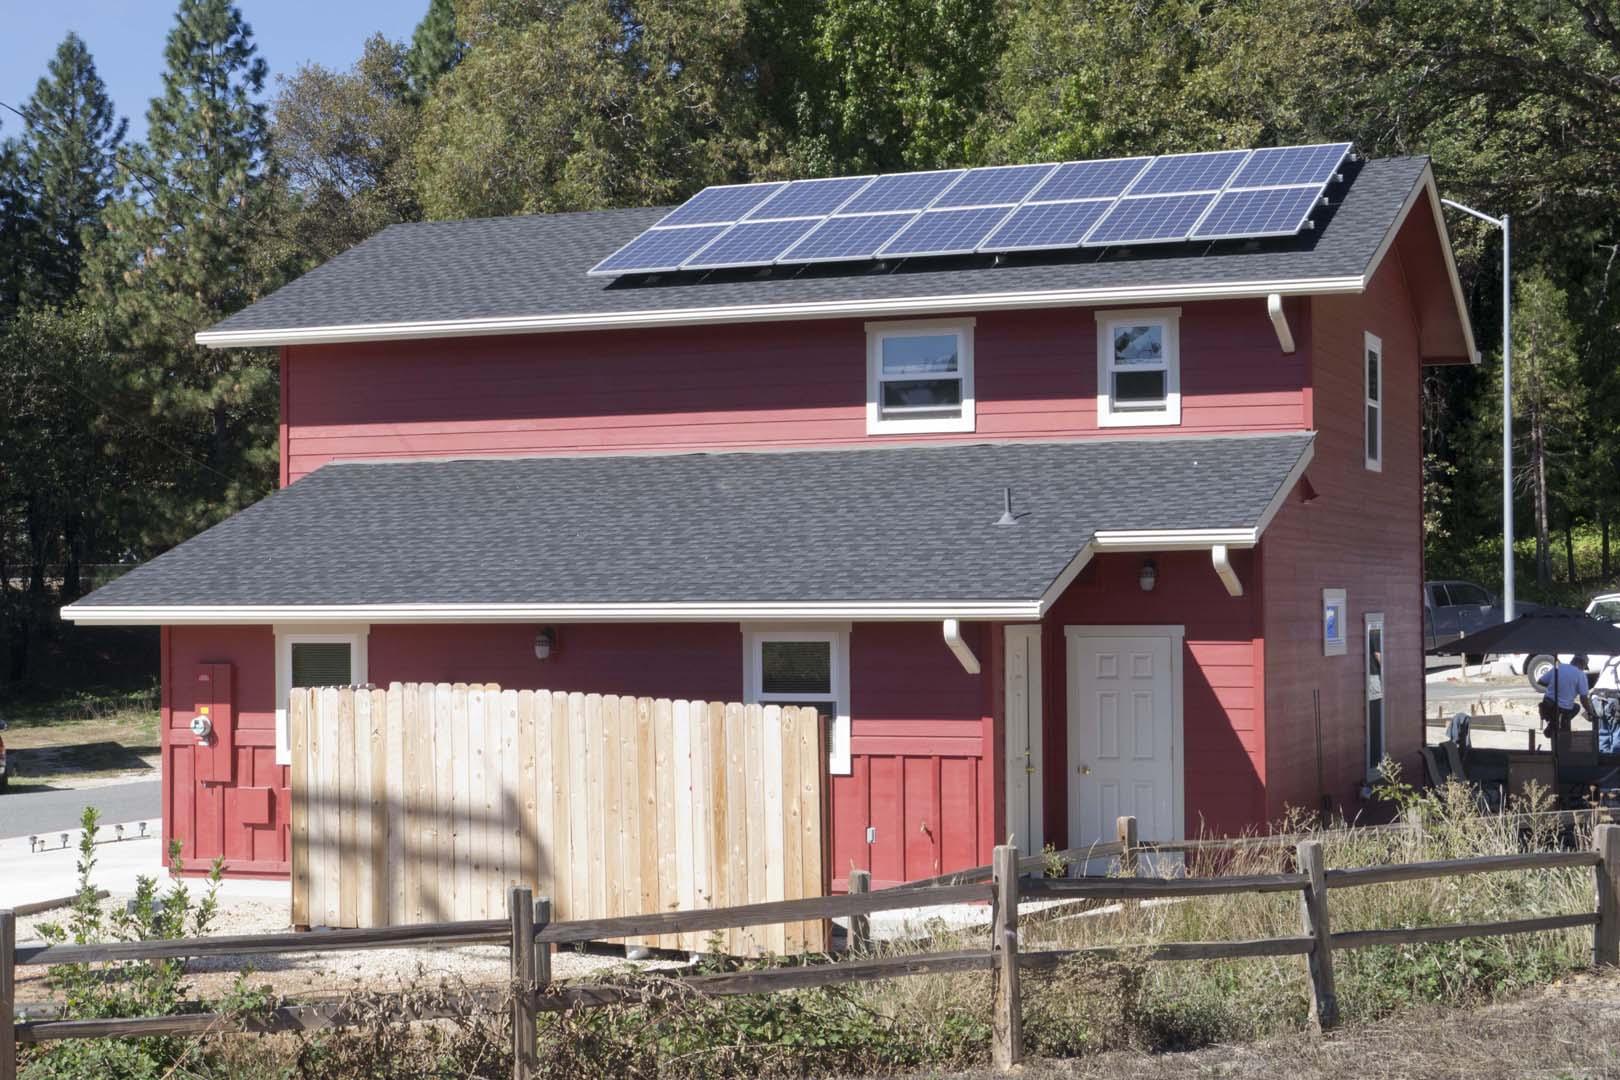 Buildblock Icf Habitat For Humanity Blitz Build House